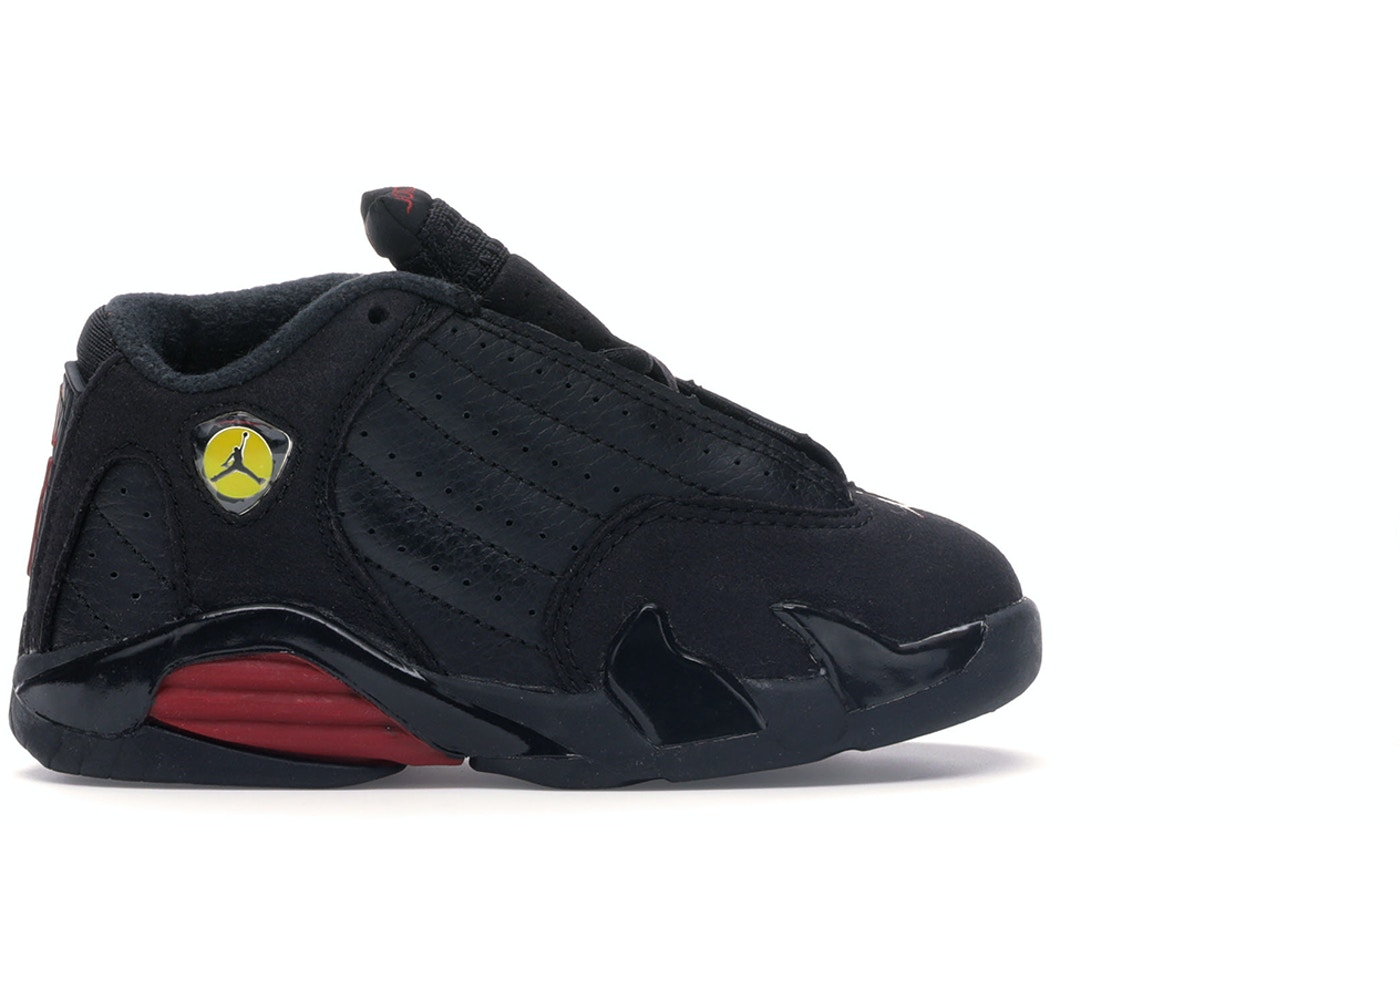 sports shoes b8c37 8ca58 Buy Air Jordan 14 Shoes   Deadstock Sneakers